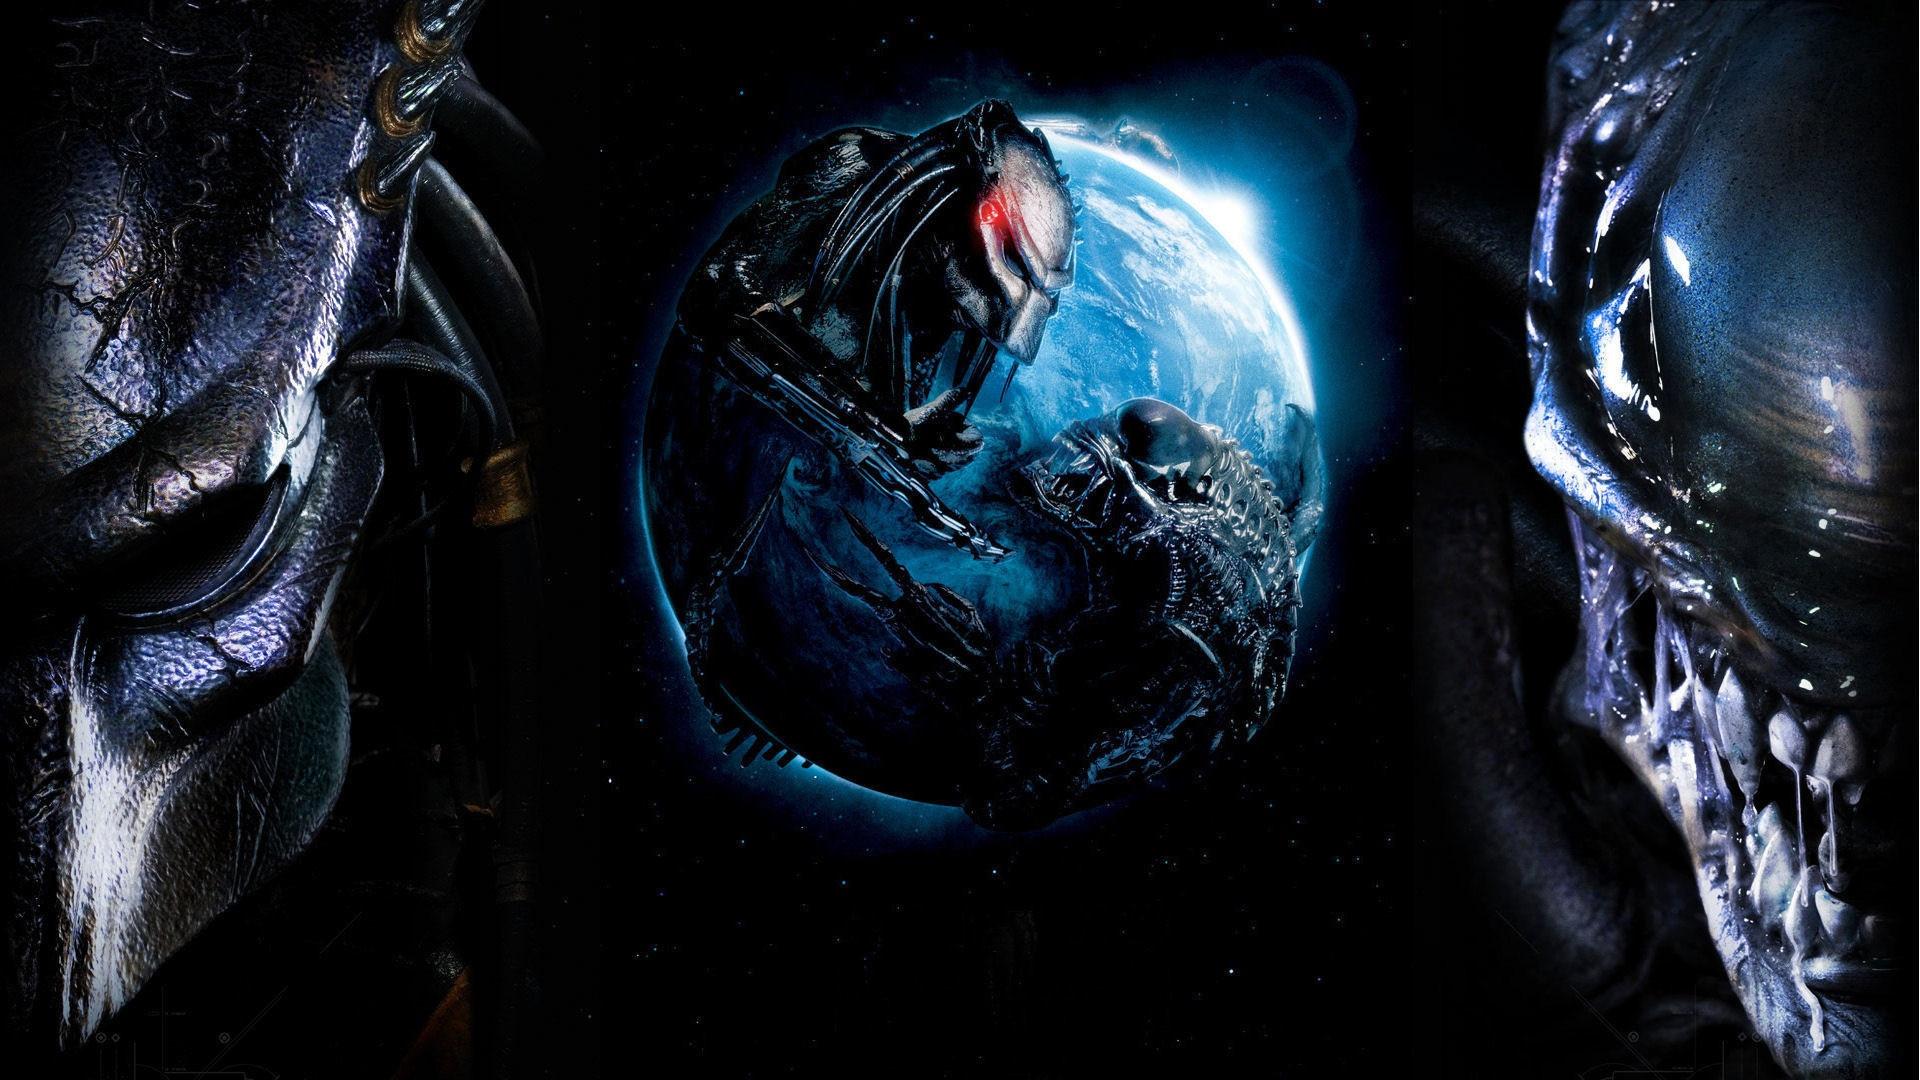 Alien vs Predator Wallpapers HD Wallpapers 1920x1080